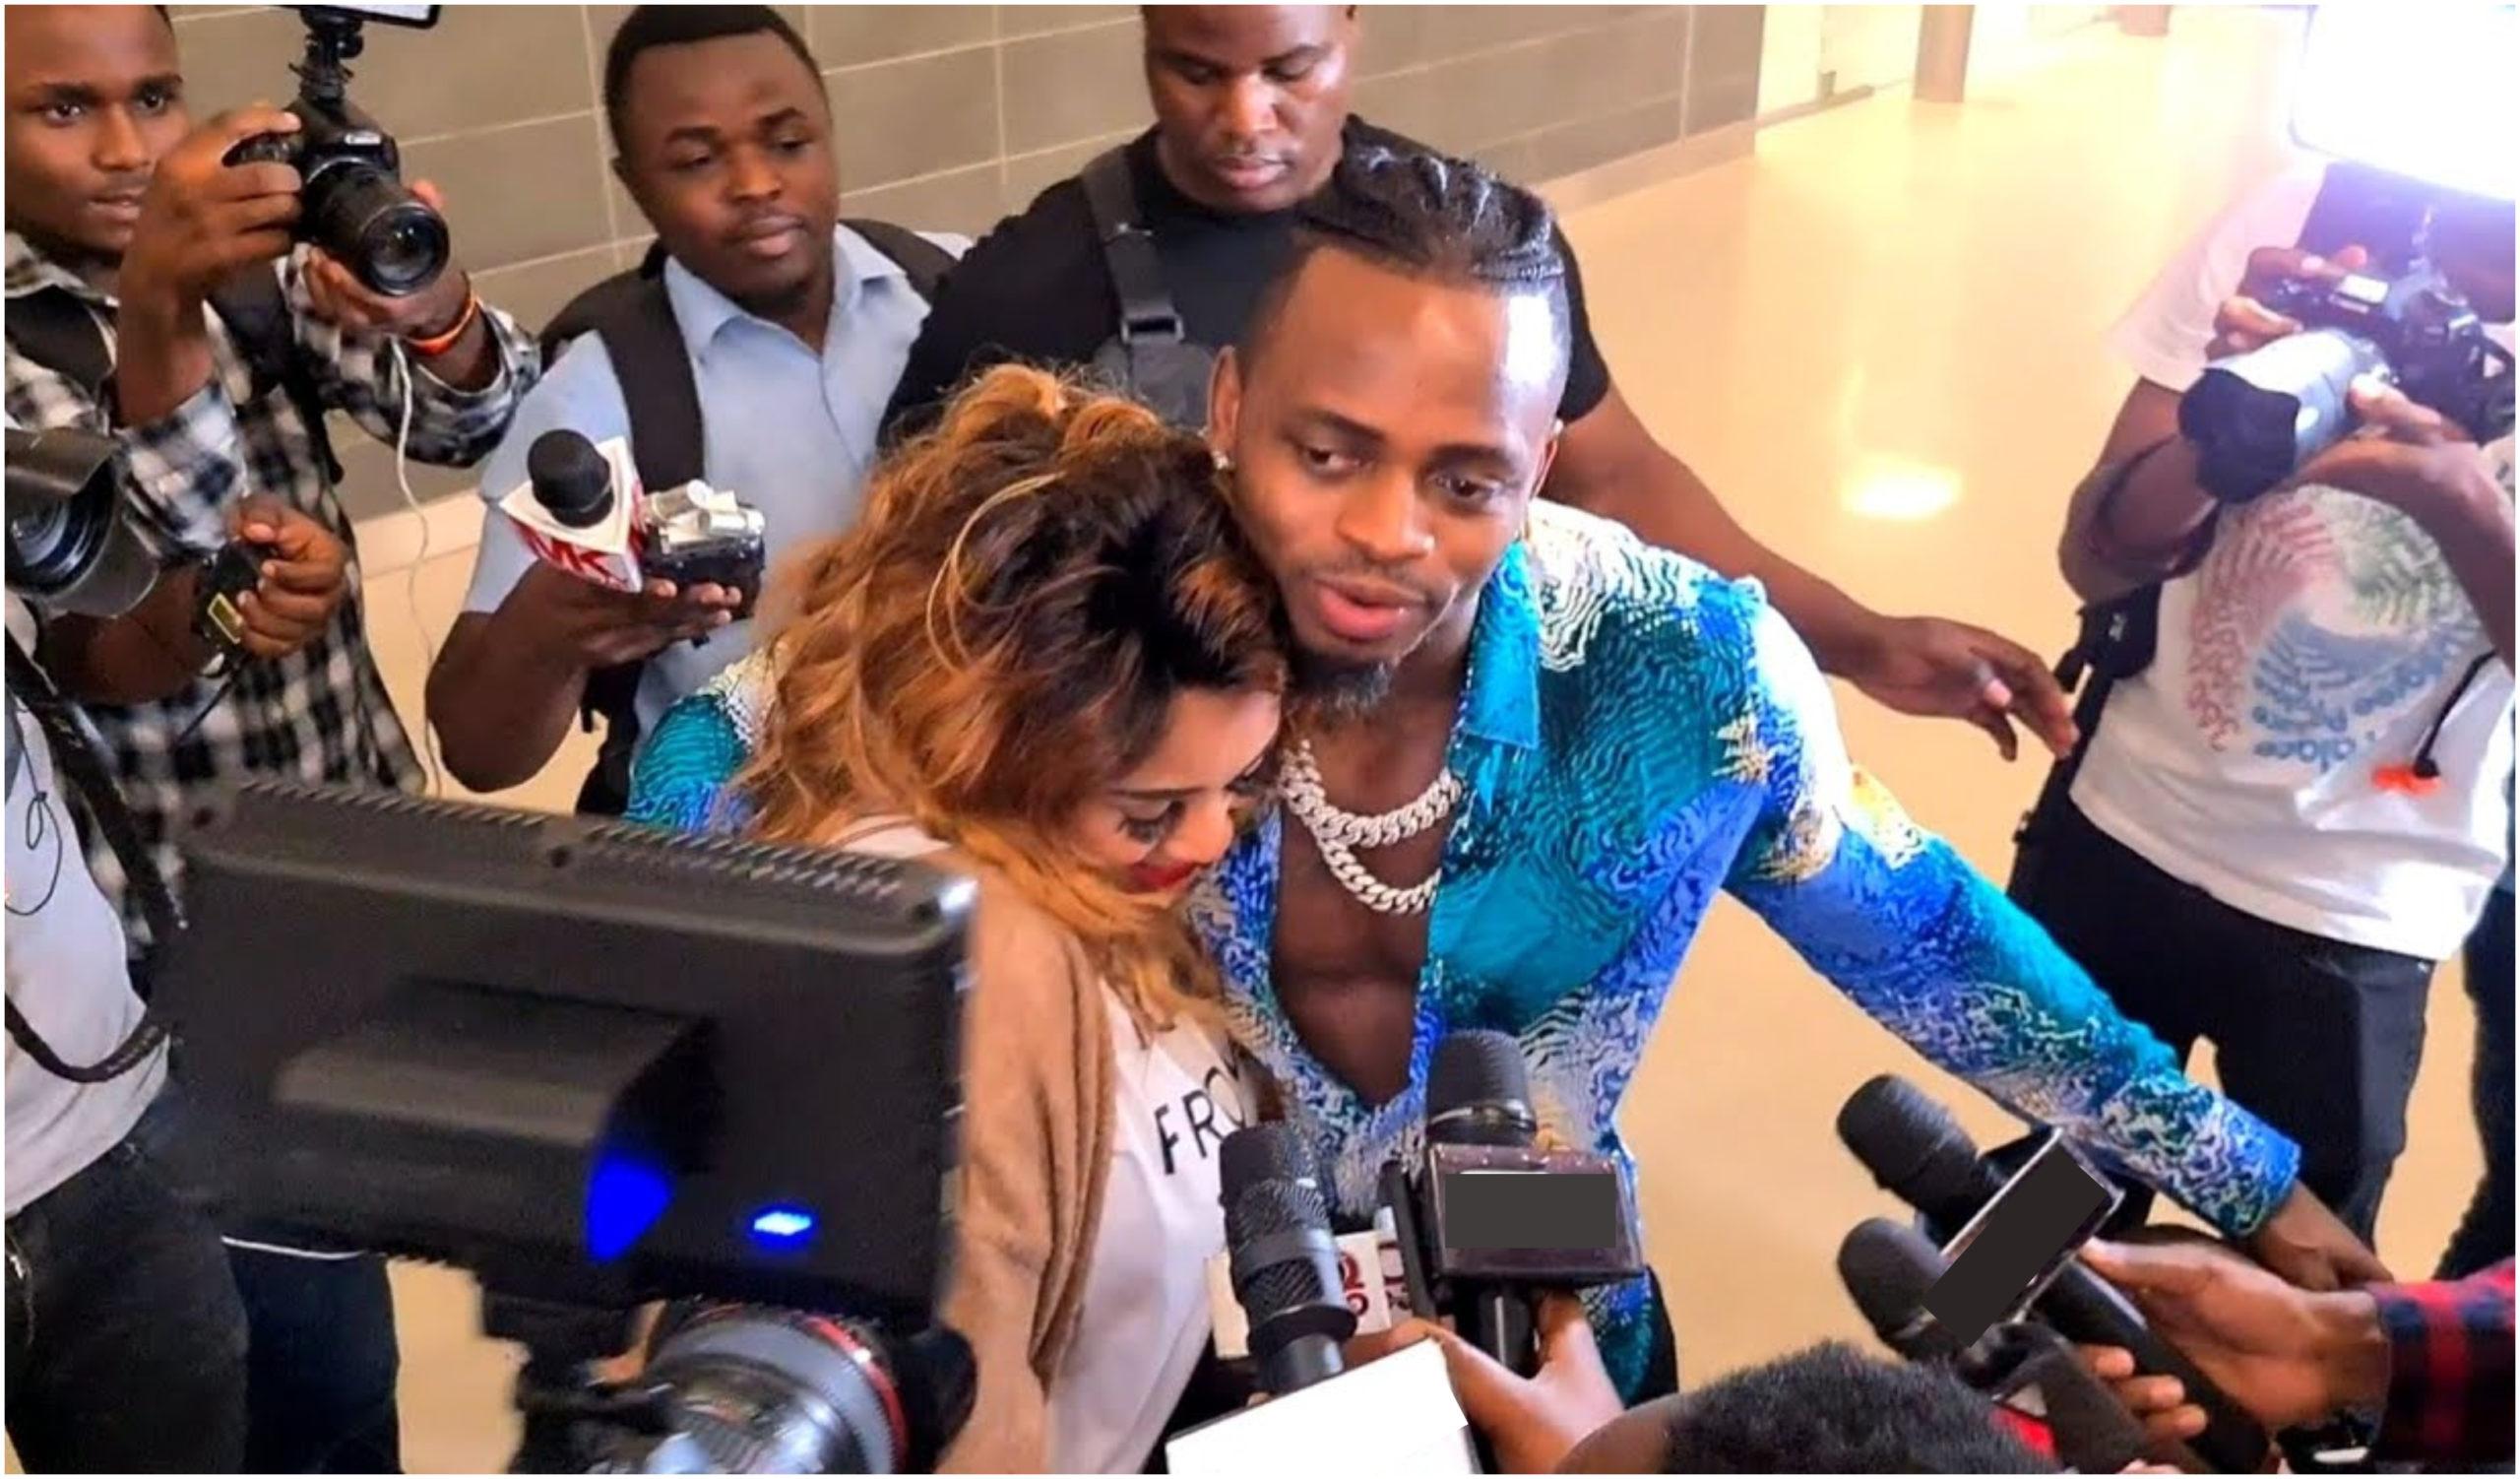 Emotional moments as Diamond Platnumz welcomes Zari and their kids into Tanzania (Video)